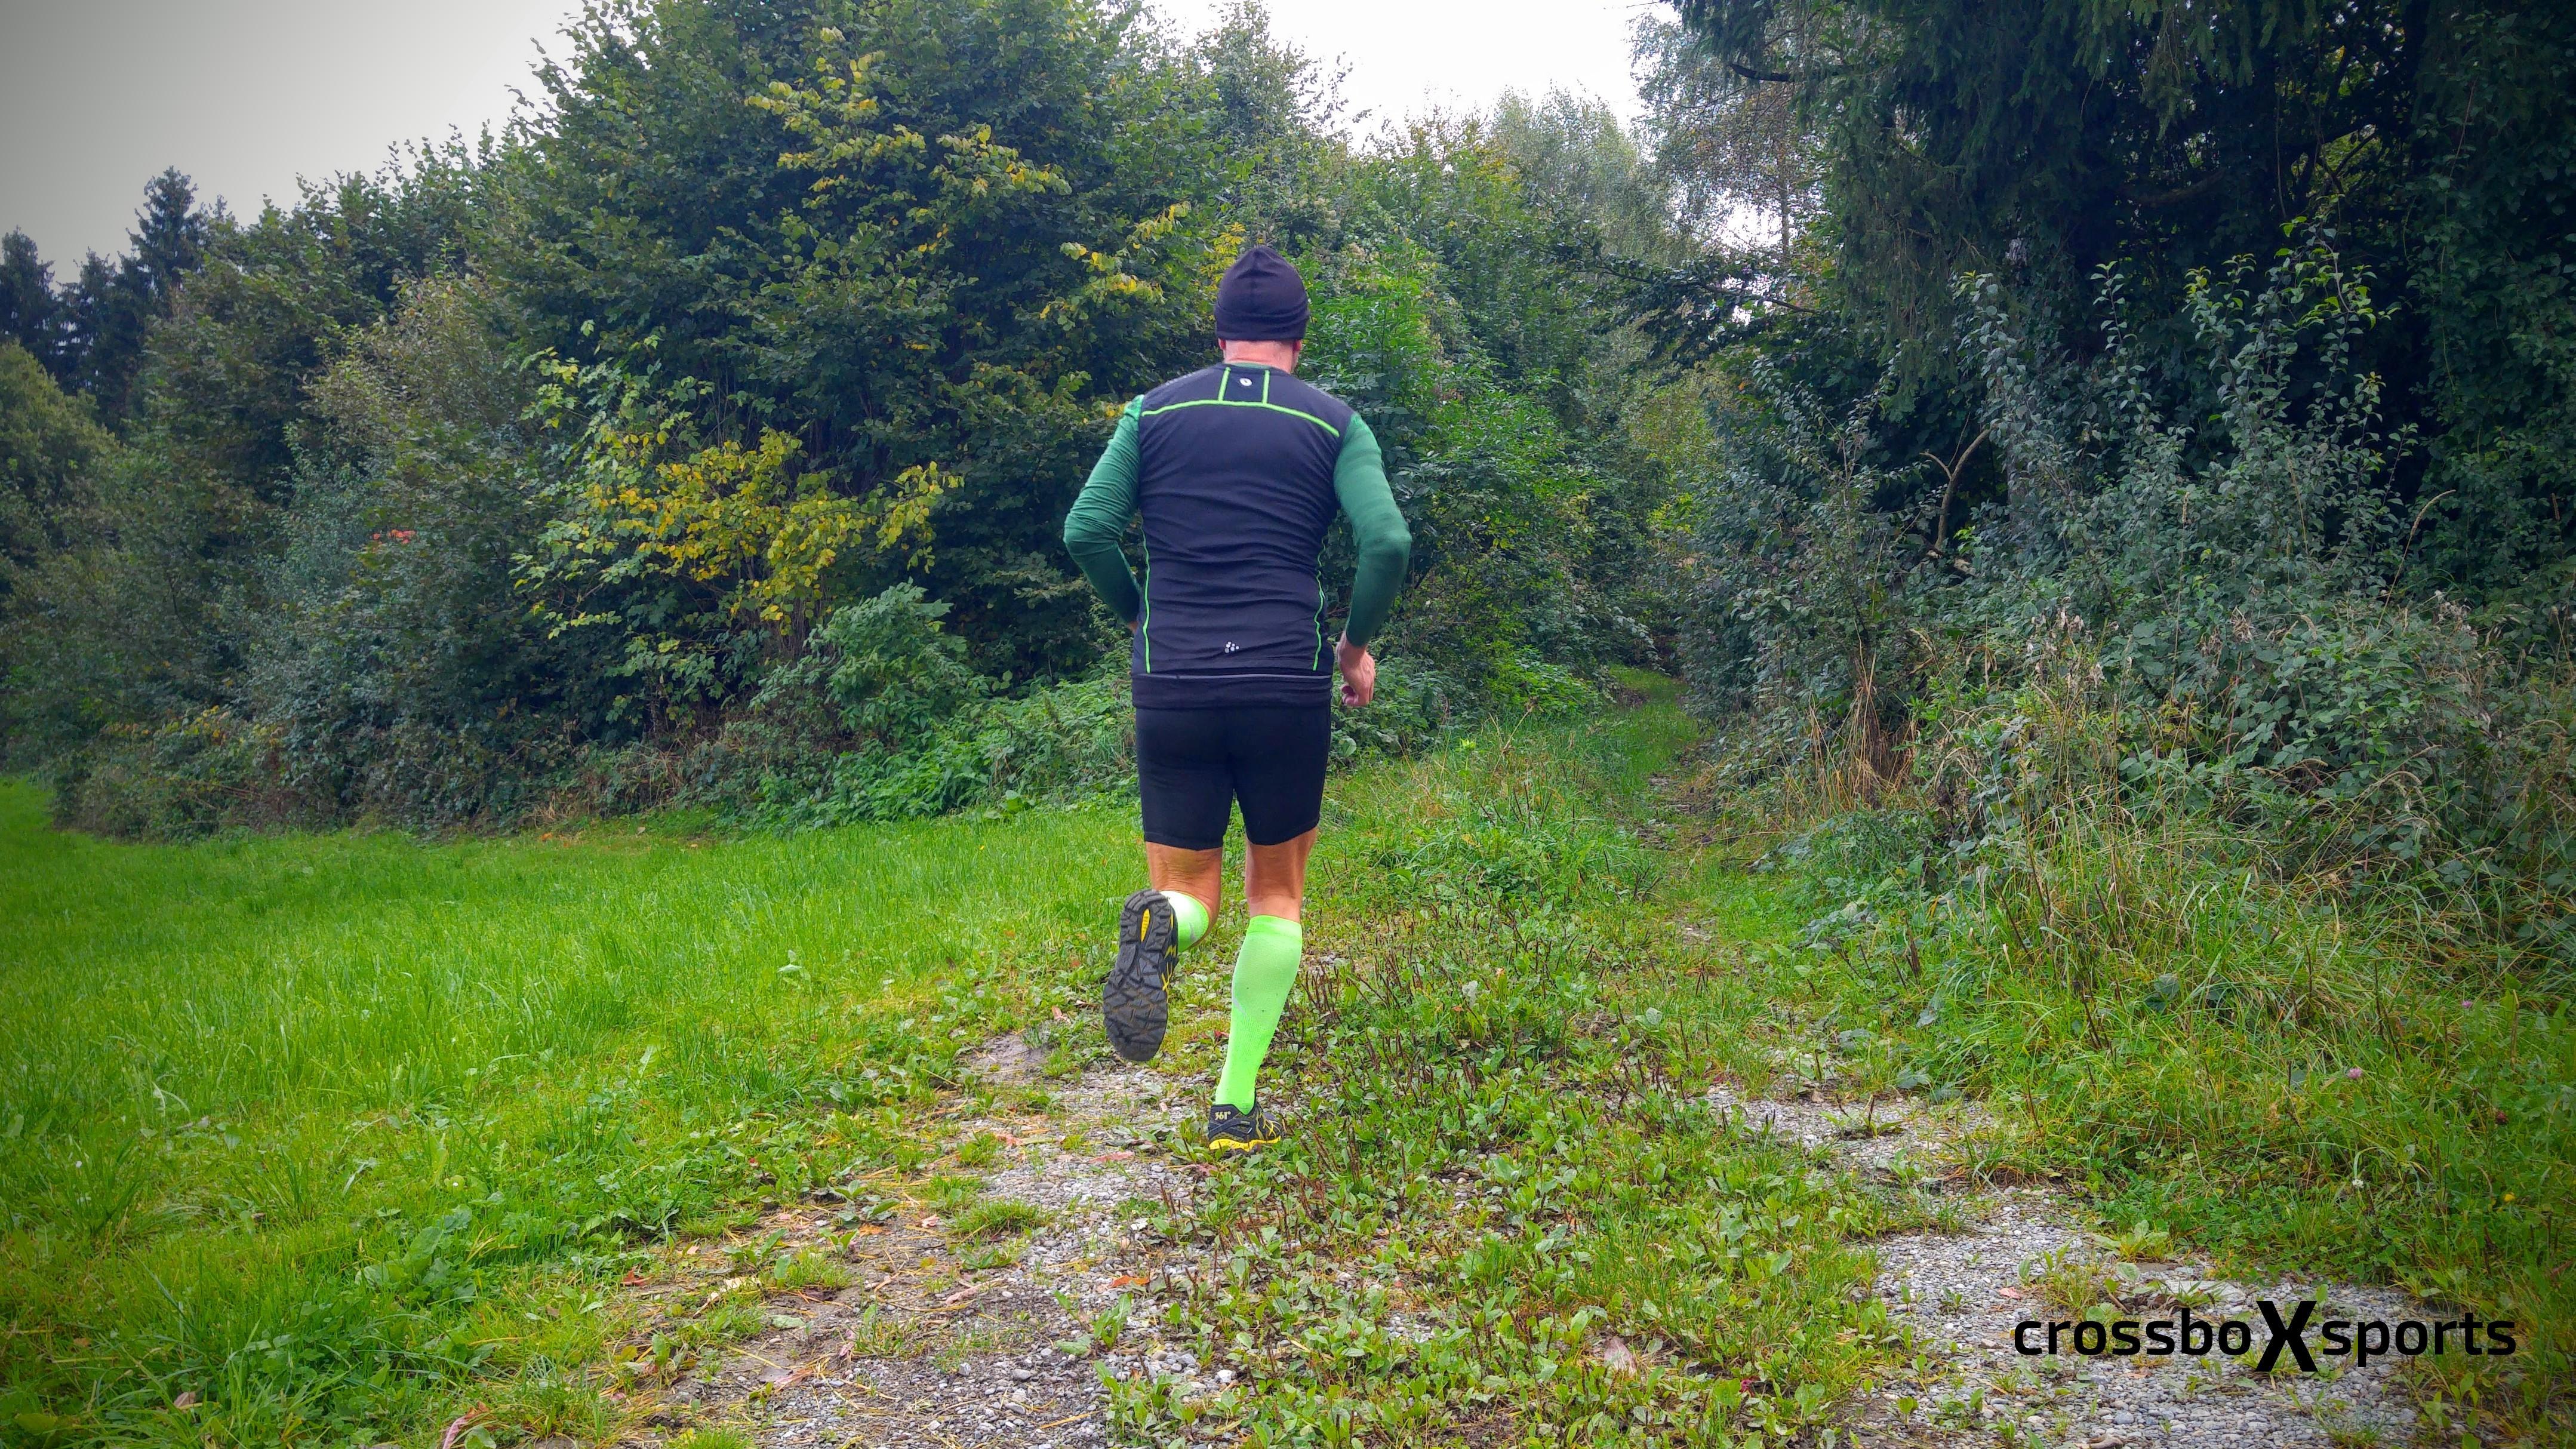 361° Ortega - einfacher Trail